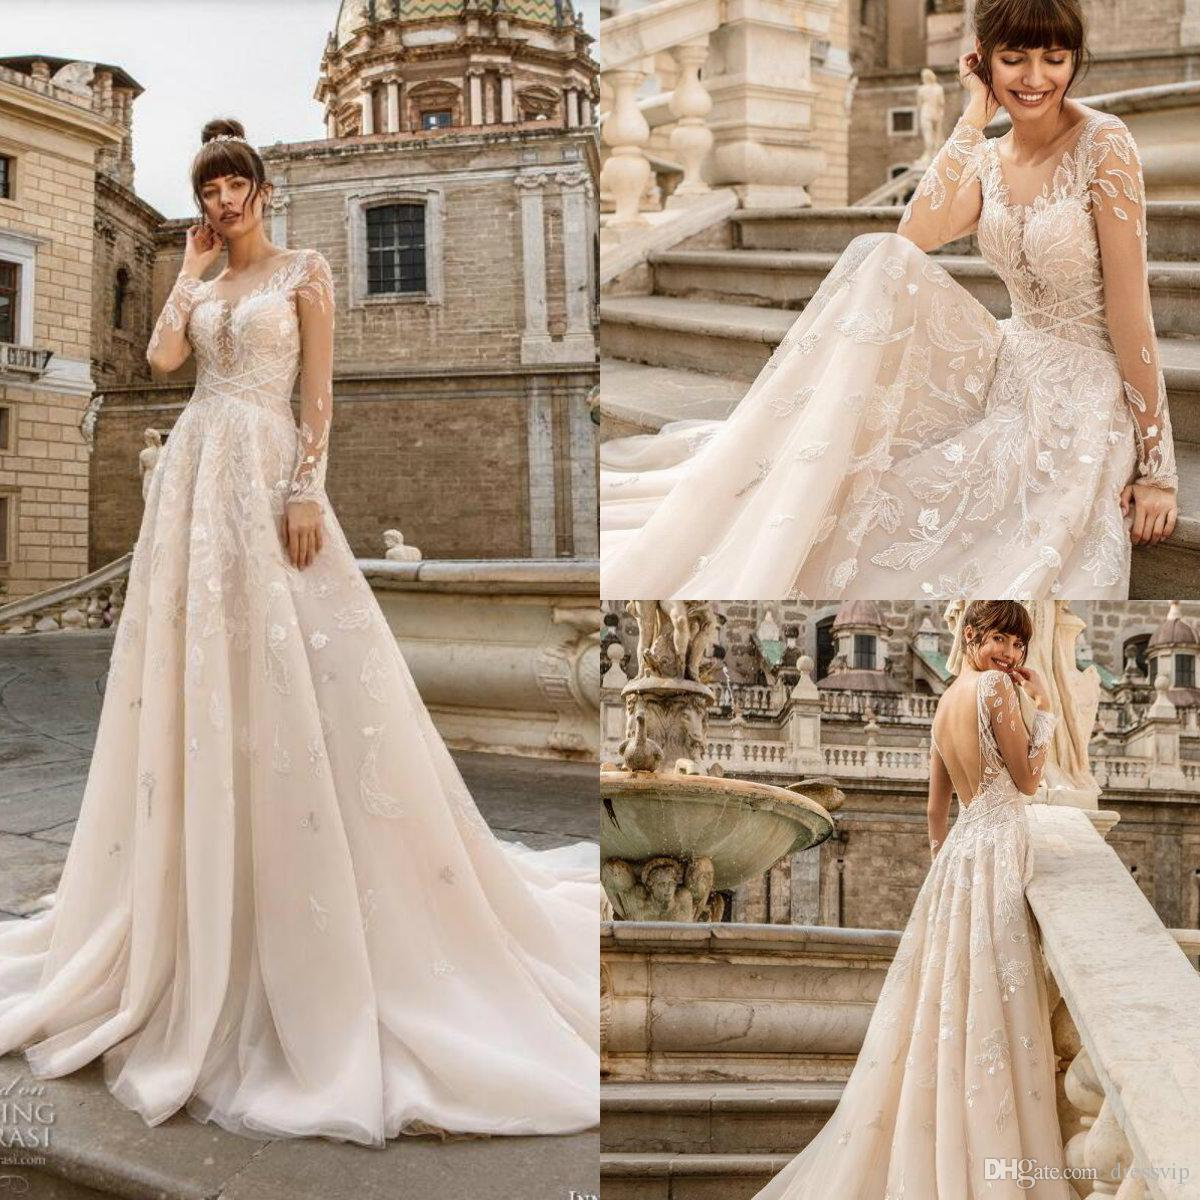 2019 Lace Boho Wedding Dresses Jewel Neck A Line Appliqued Sweep Train  Bohemian Wedding Dress Plus Size Country Beach Bridal Gowns